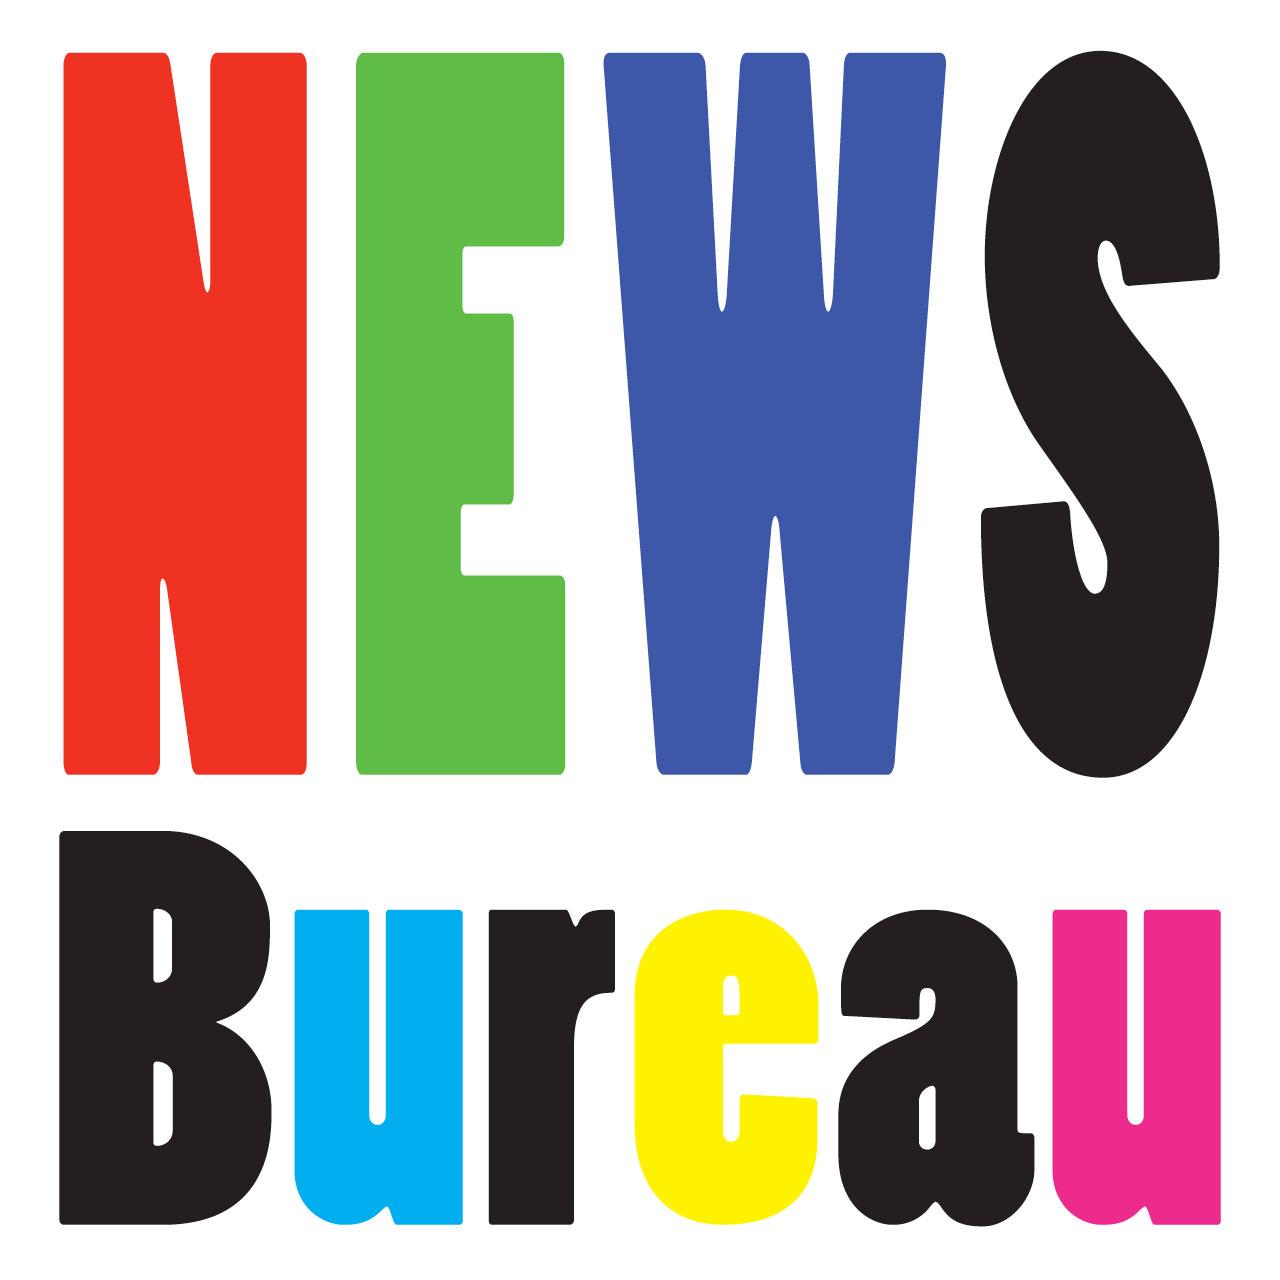 News Bureau